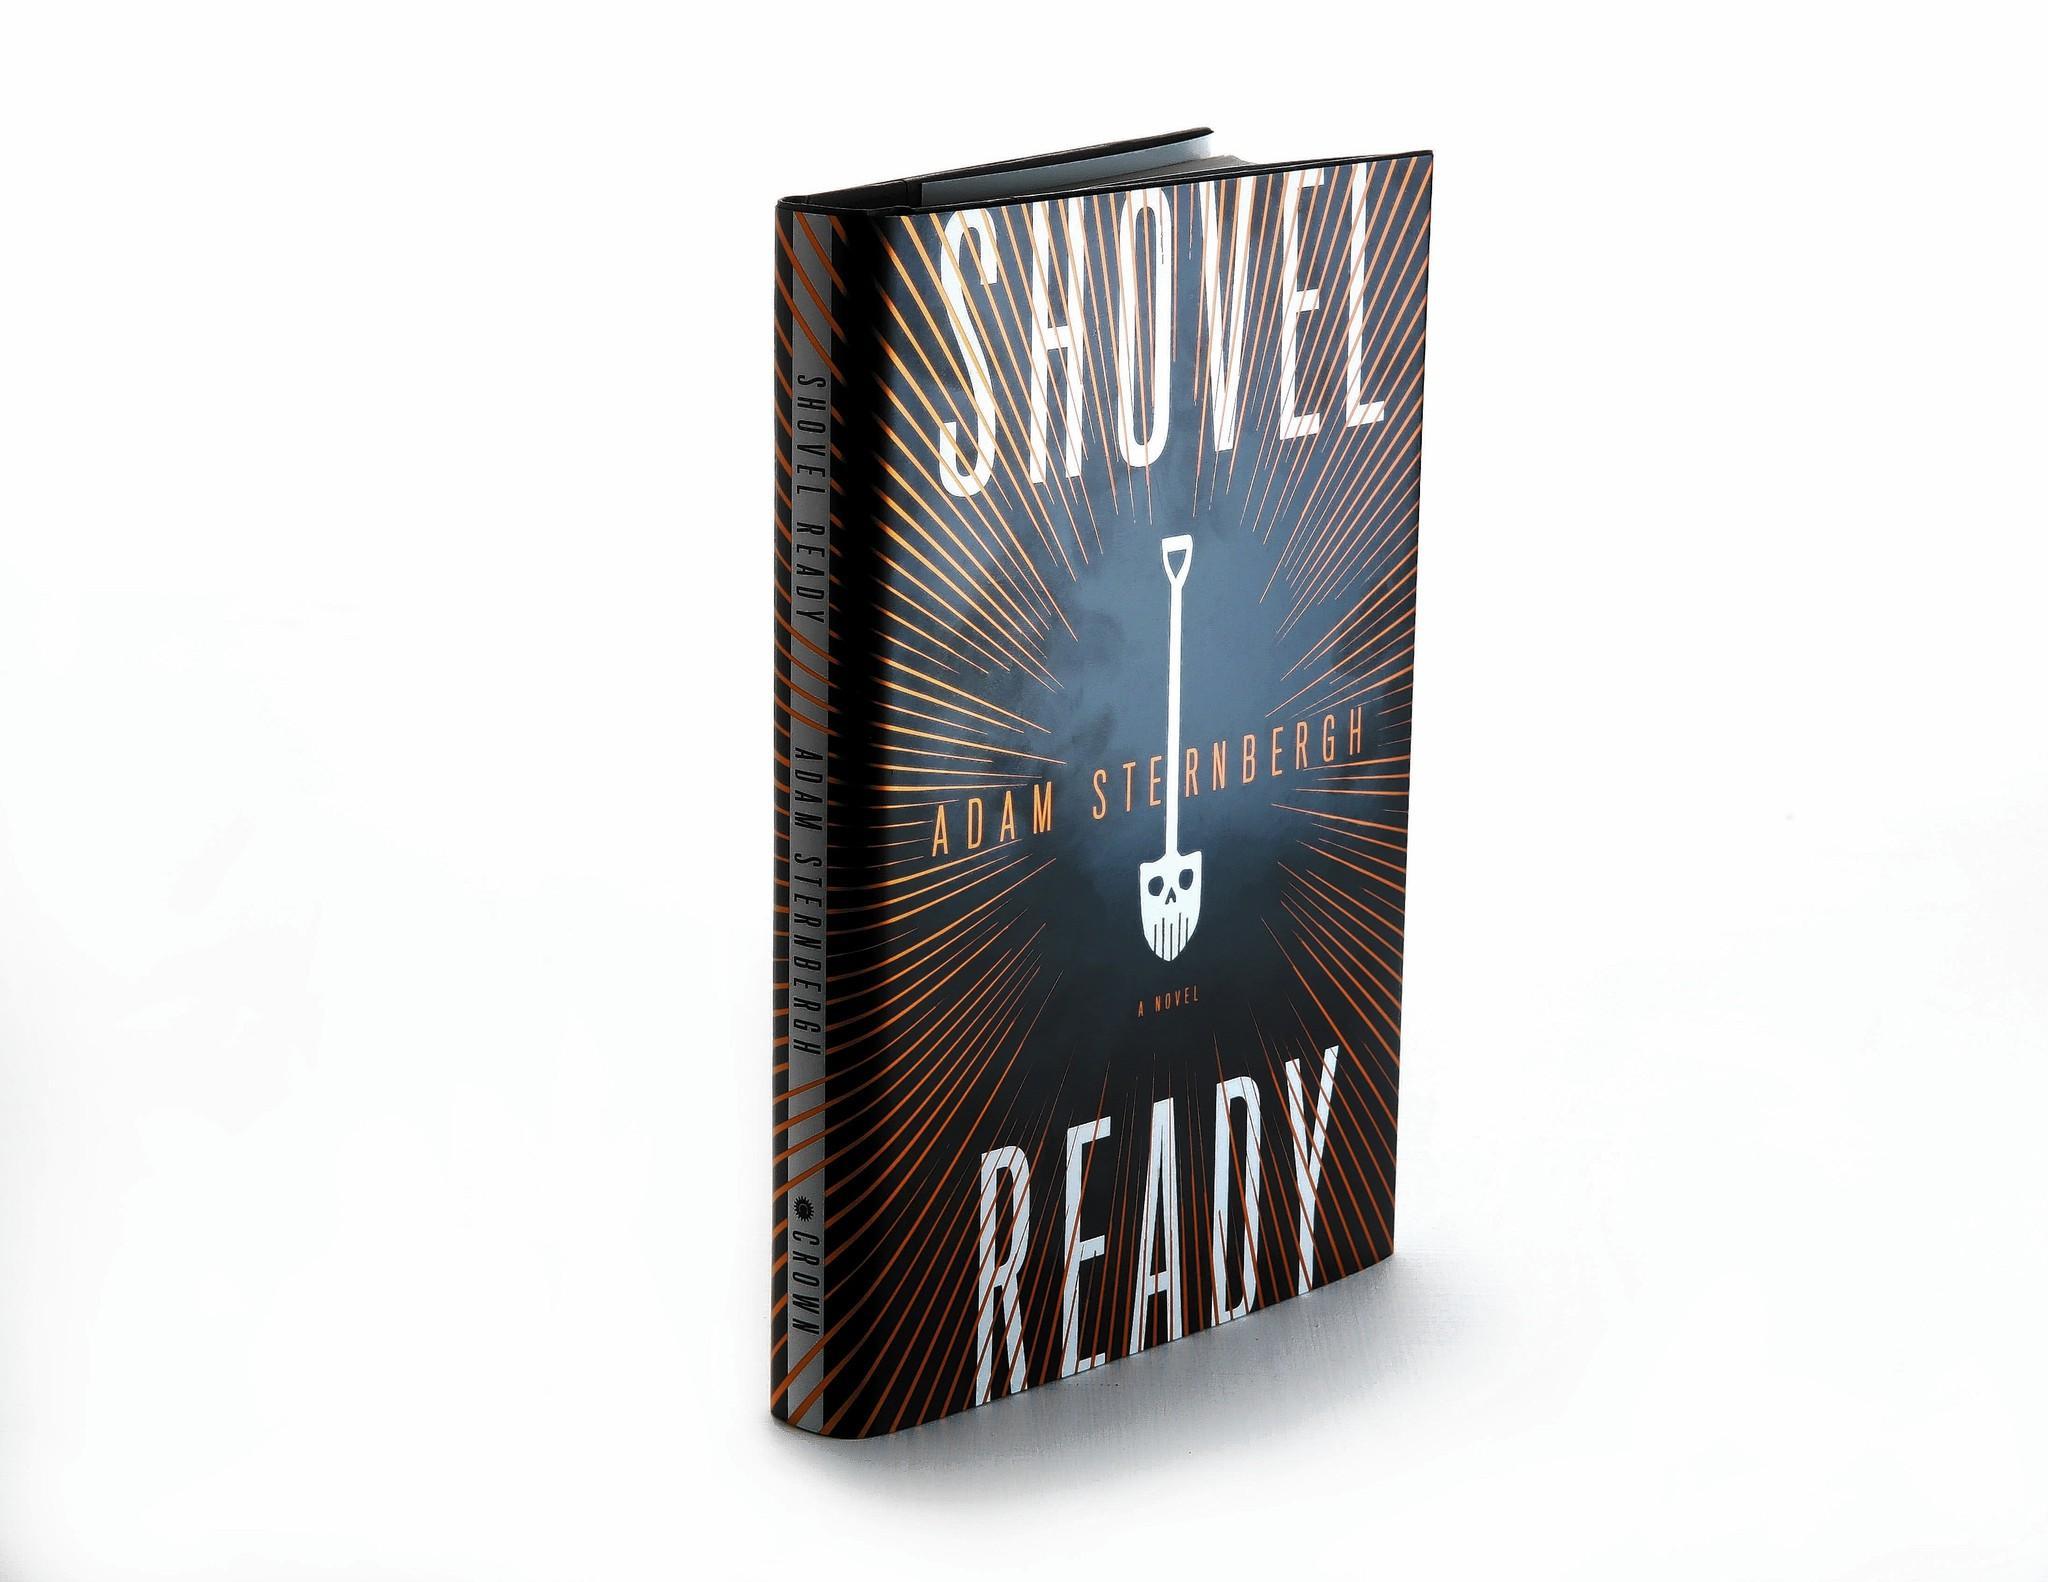 """Shovel Ready,"" Adam Sternbergh's debut novel, is about a hit man who calls himself a ""garbageman."""